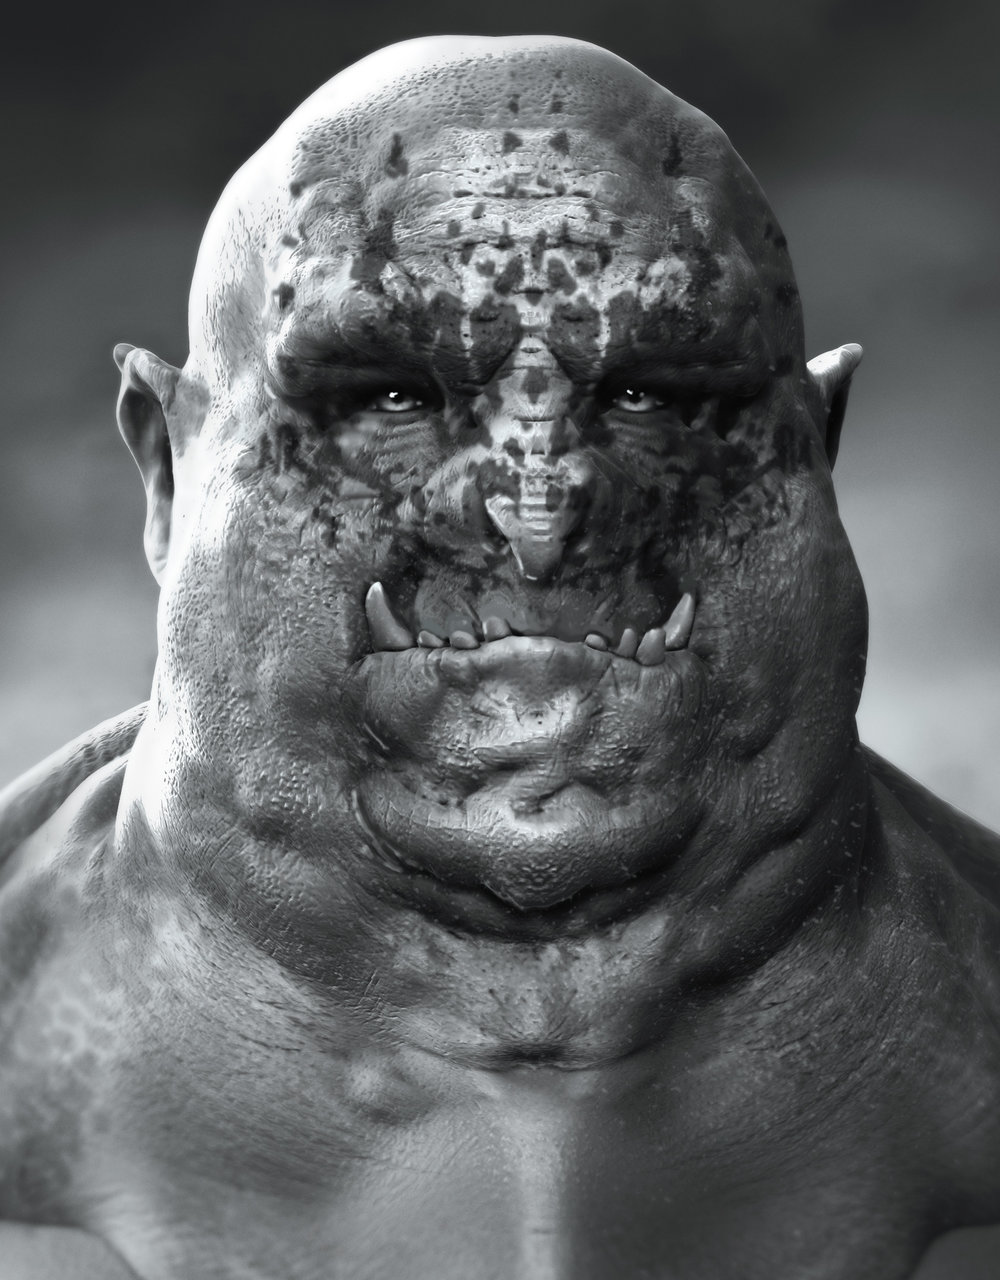 BRIGHT Fat orc _002a_jgf.jpg